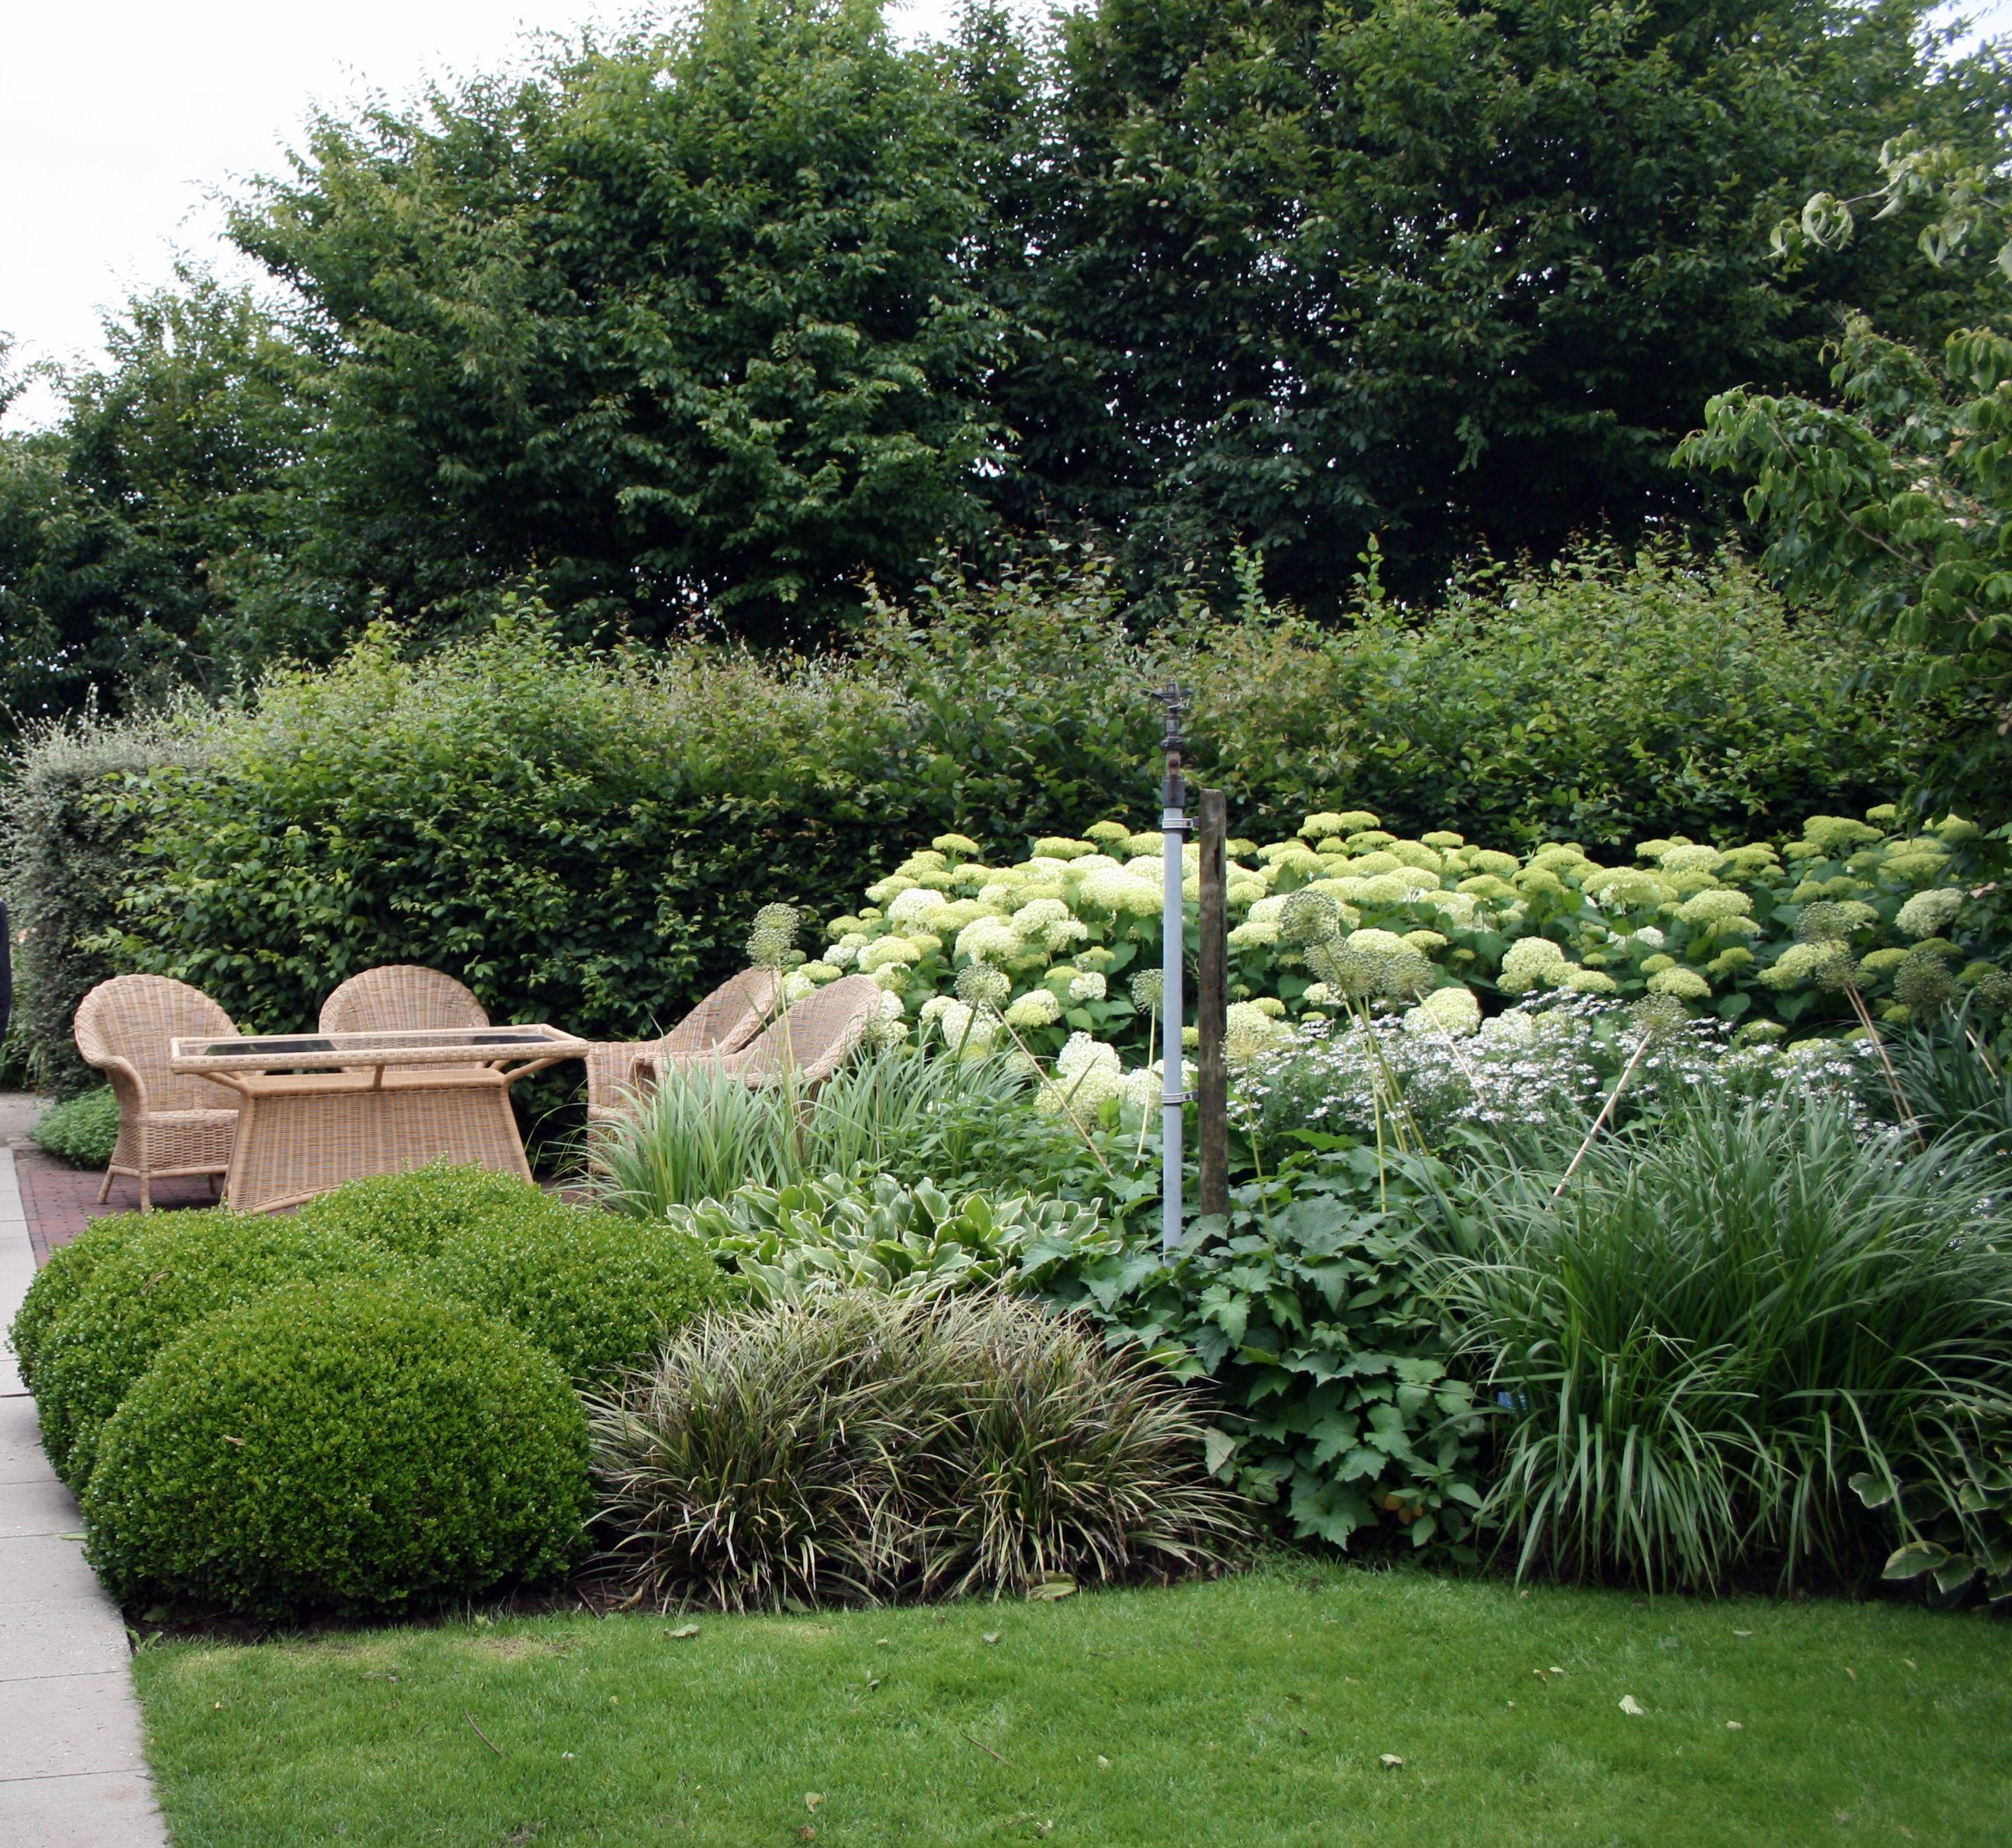 Sitzplatz Hortensien Gartenreise Belgien Holland Hortensien Garten Gartengestaltung Garten